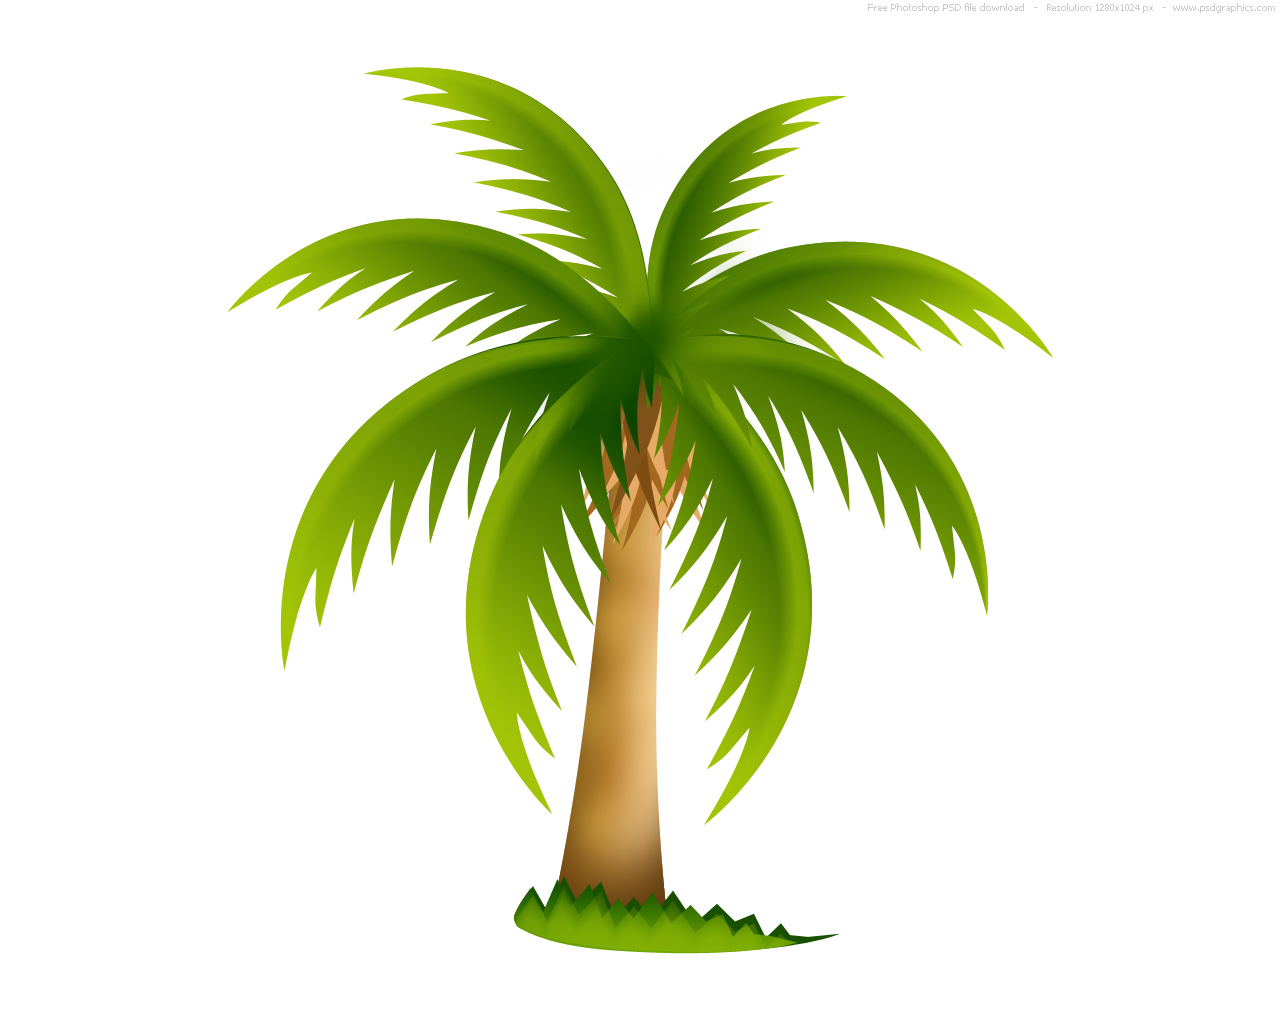 Tree Clipart | Palm Tree image - vector clip art online, royalty free u0026amp; public